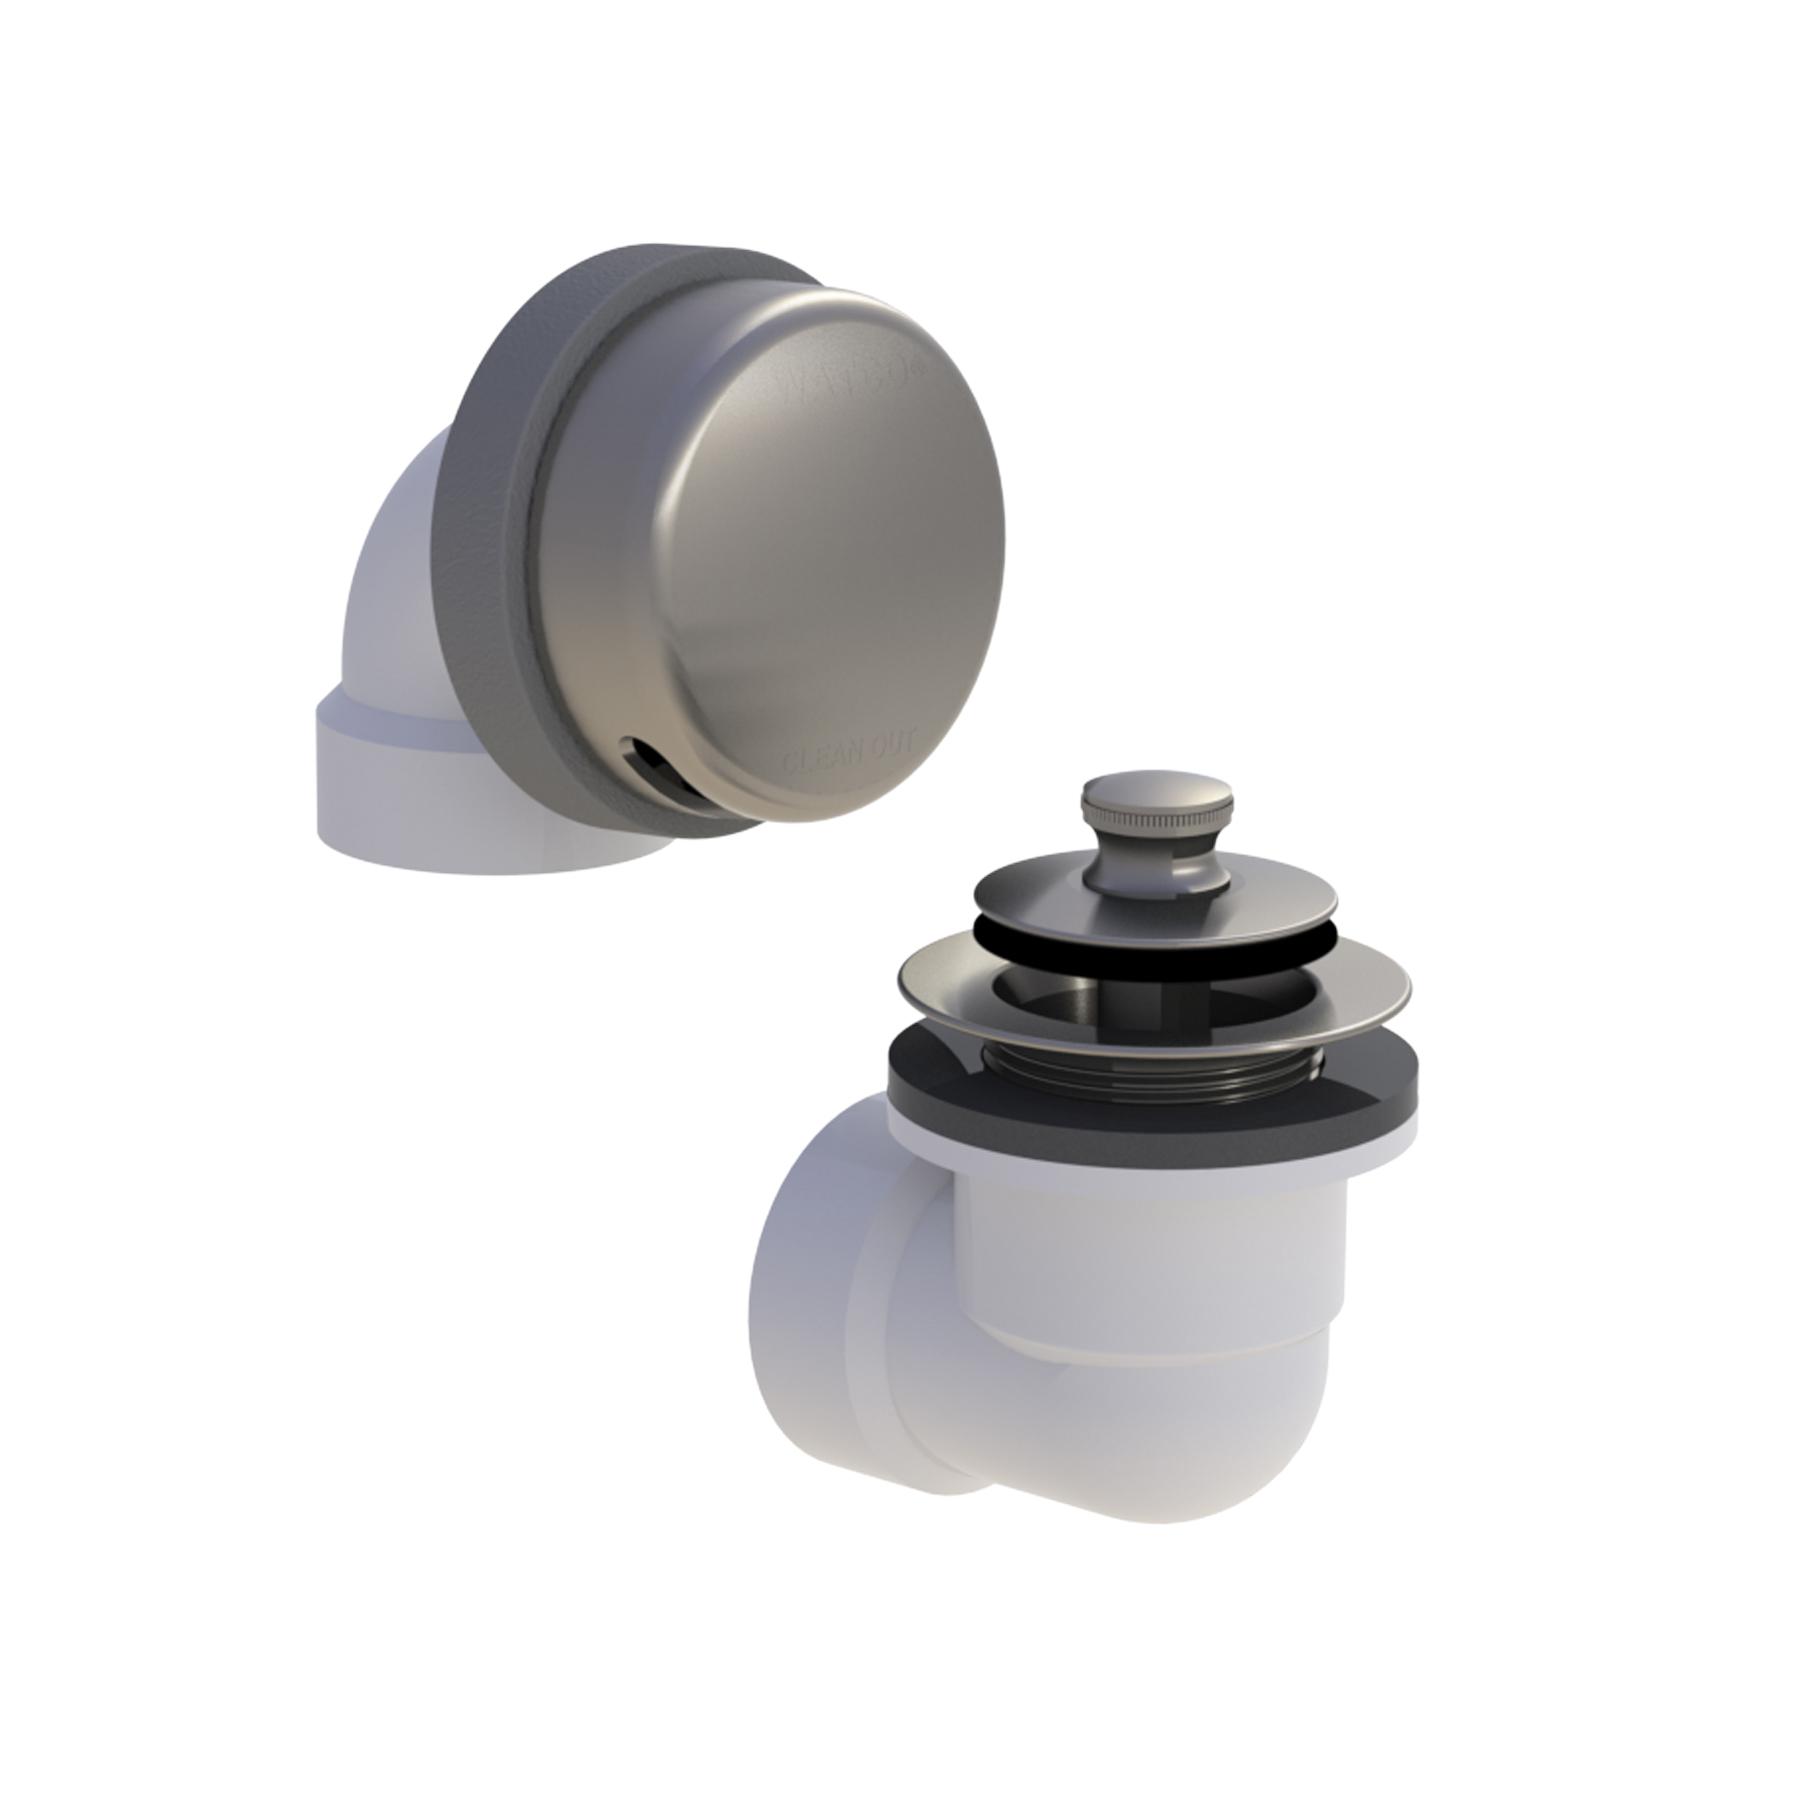 Watco® Innovator® 901 Solvent Weld Bath Waste Half Kit, SCH 40/STD PVC